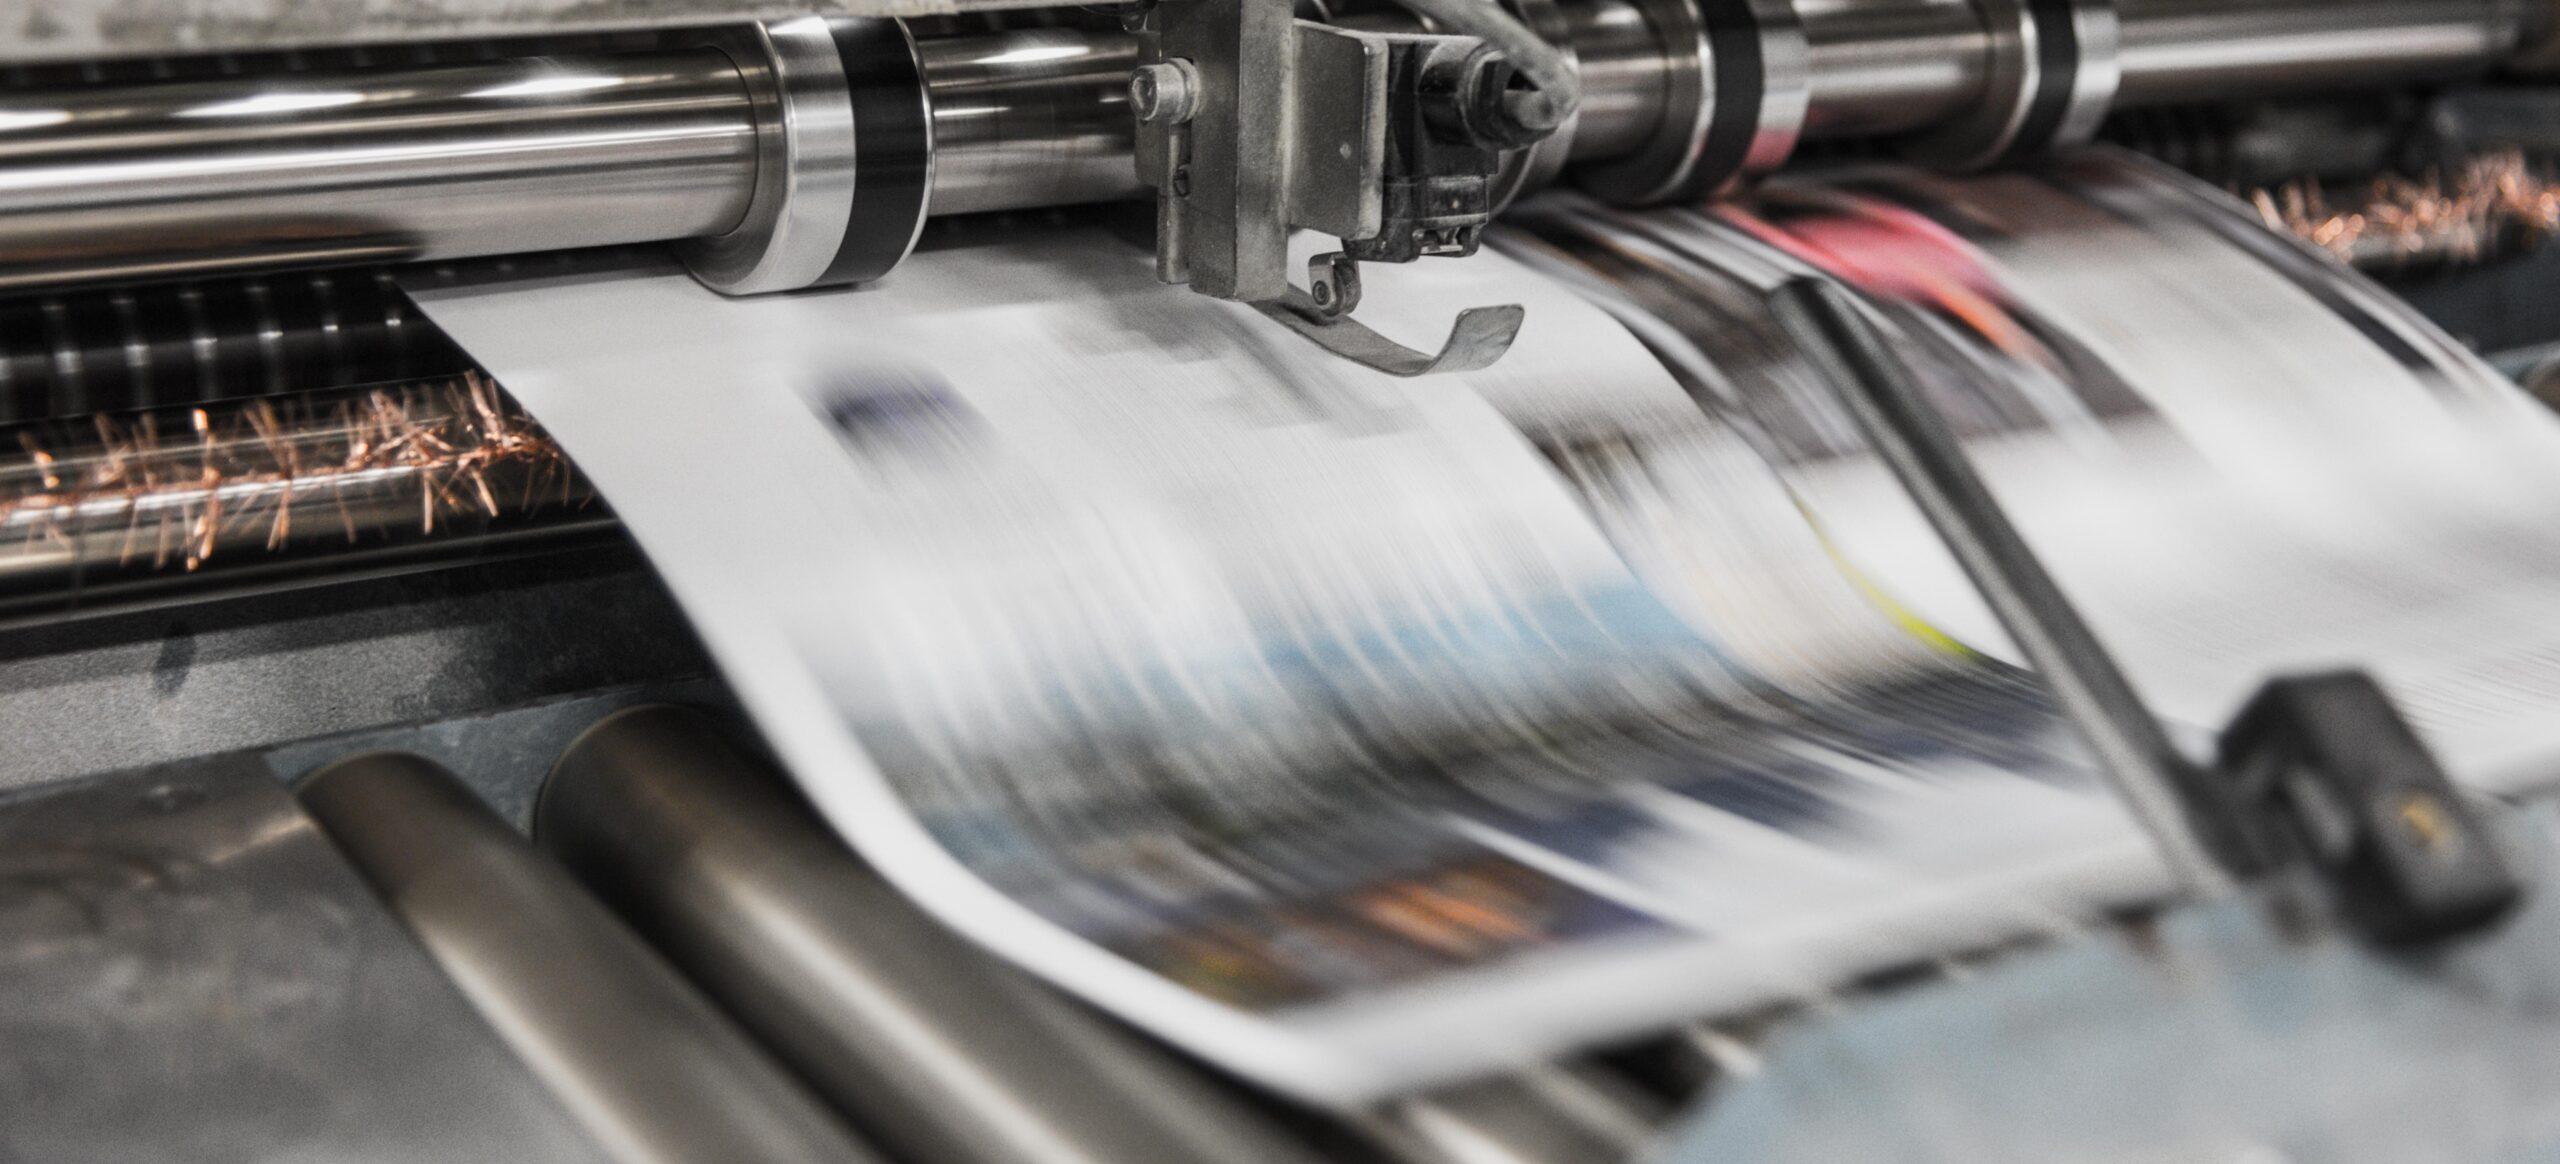 Newspaper printing press - Rachel Writes blog 'I'm a small business, do I need to write press releases?'